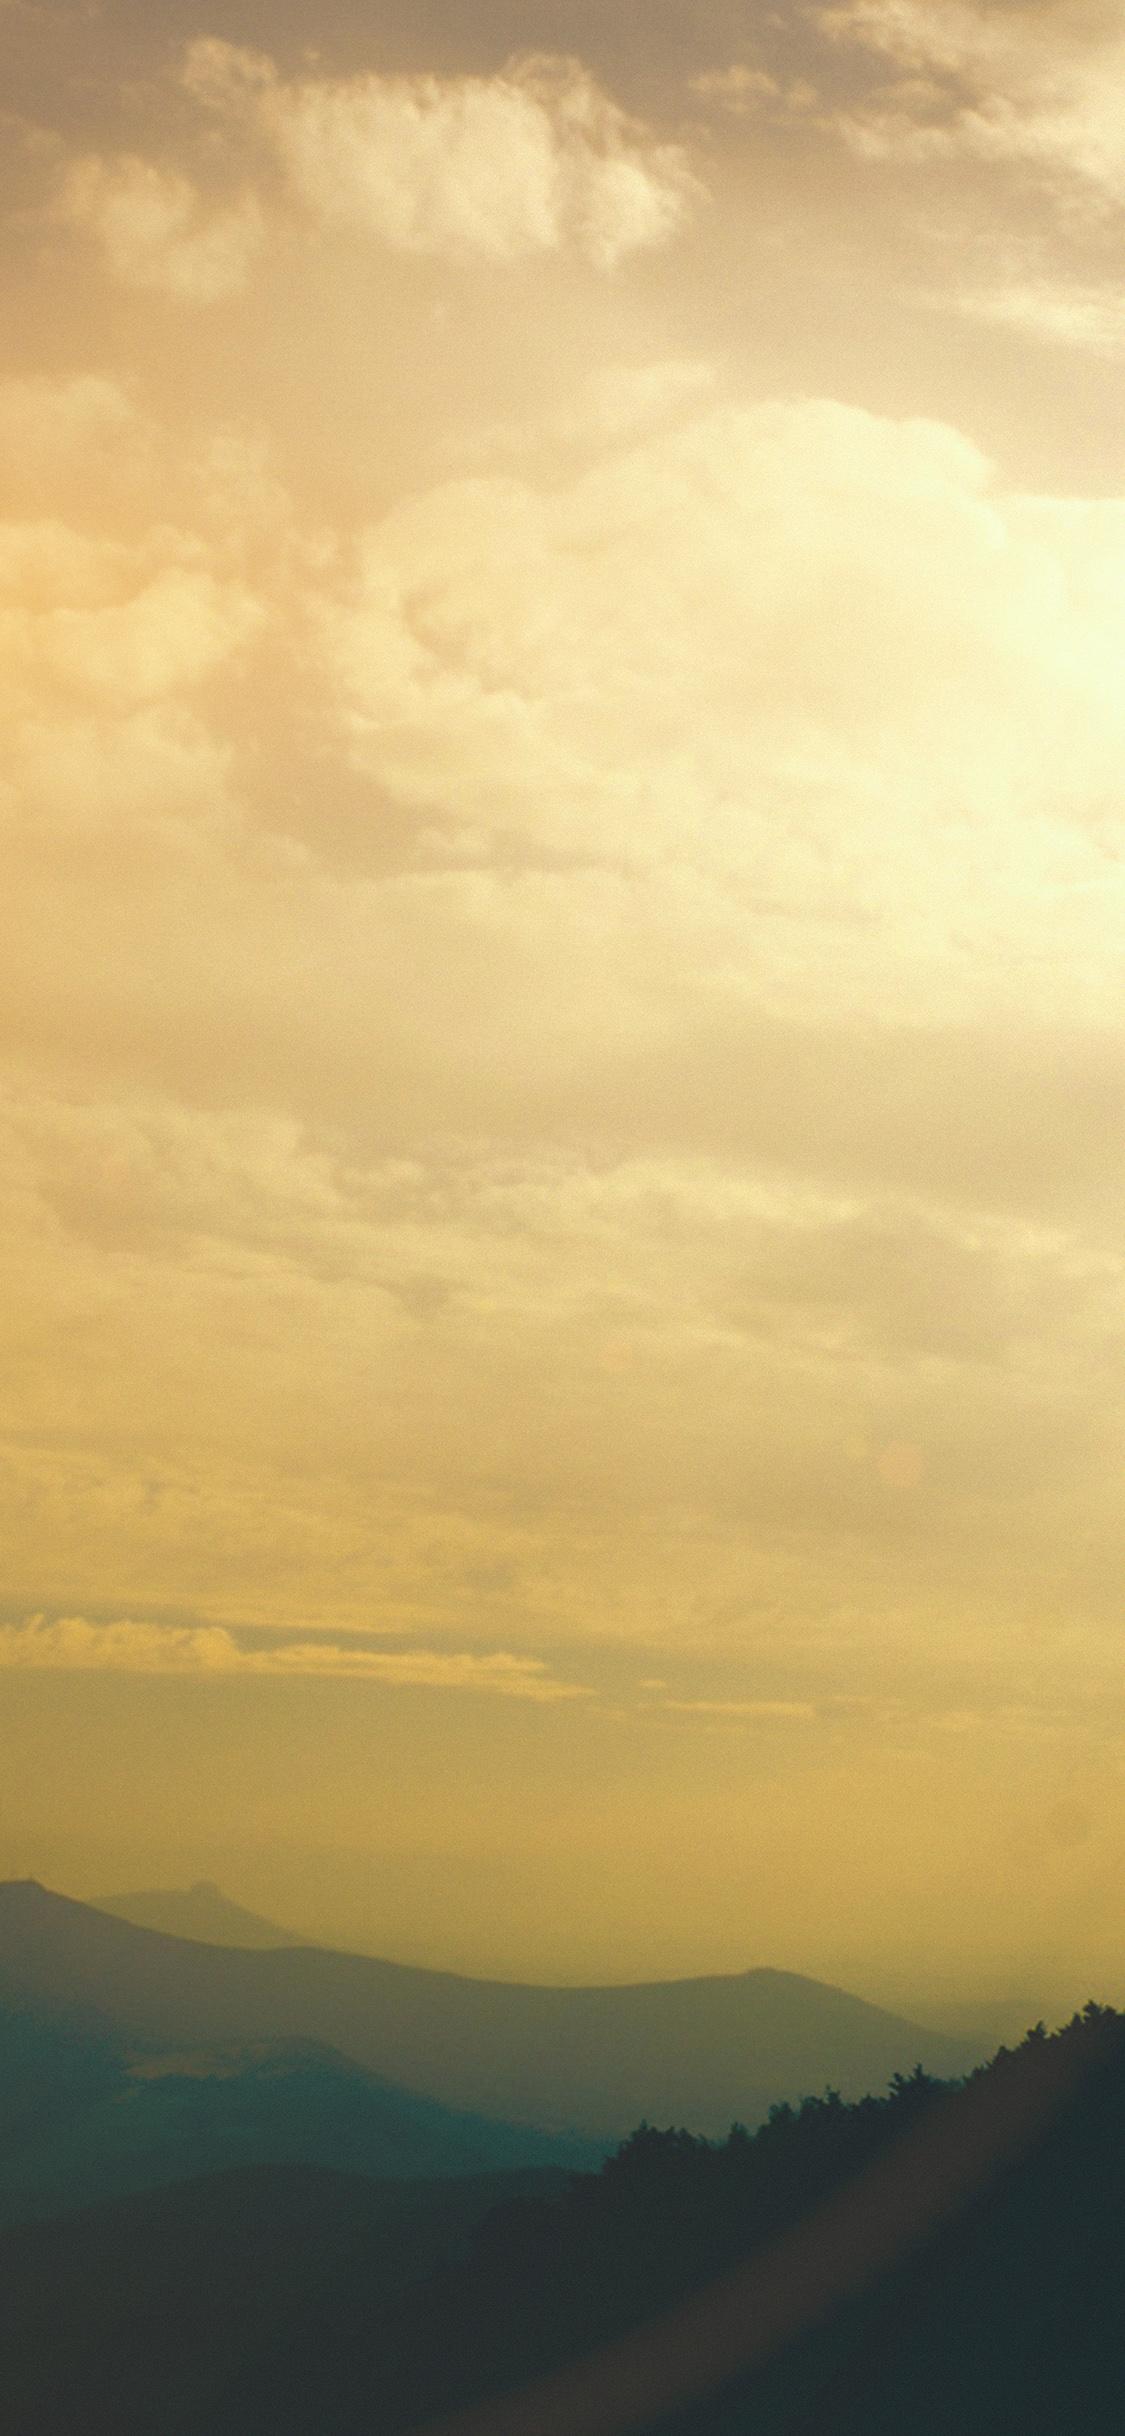 iPhoneXpapers.com-Apple-iPhone-wallpaper-mq93-the-end-sunrise-sky-cloud-shine-nature-orange